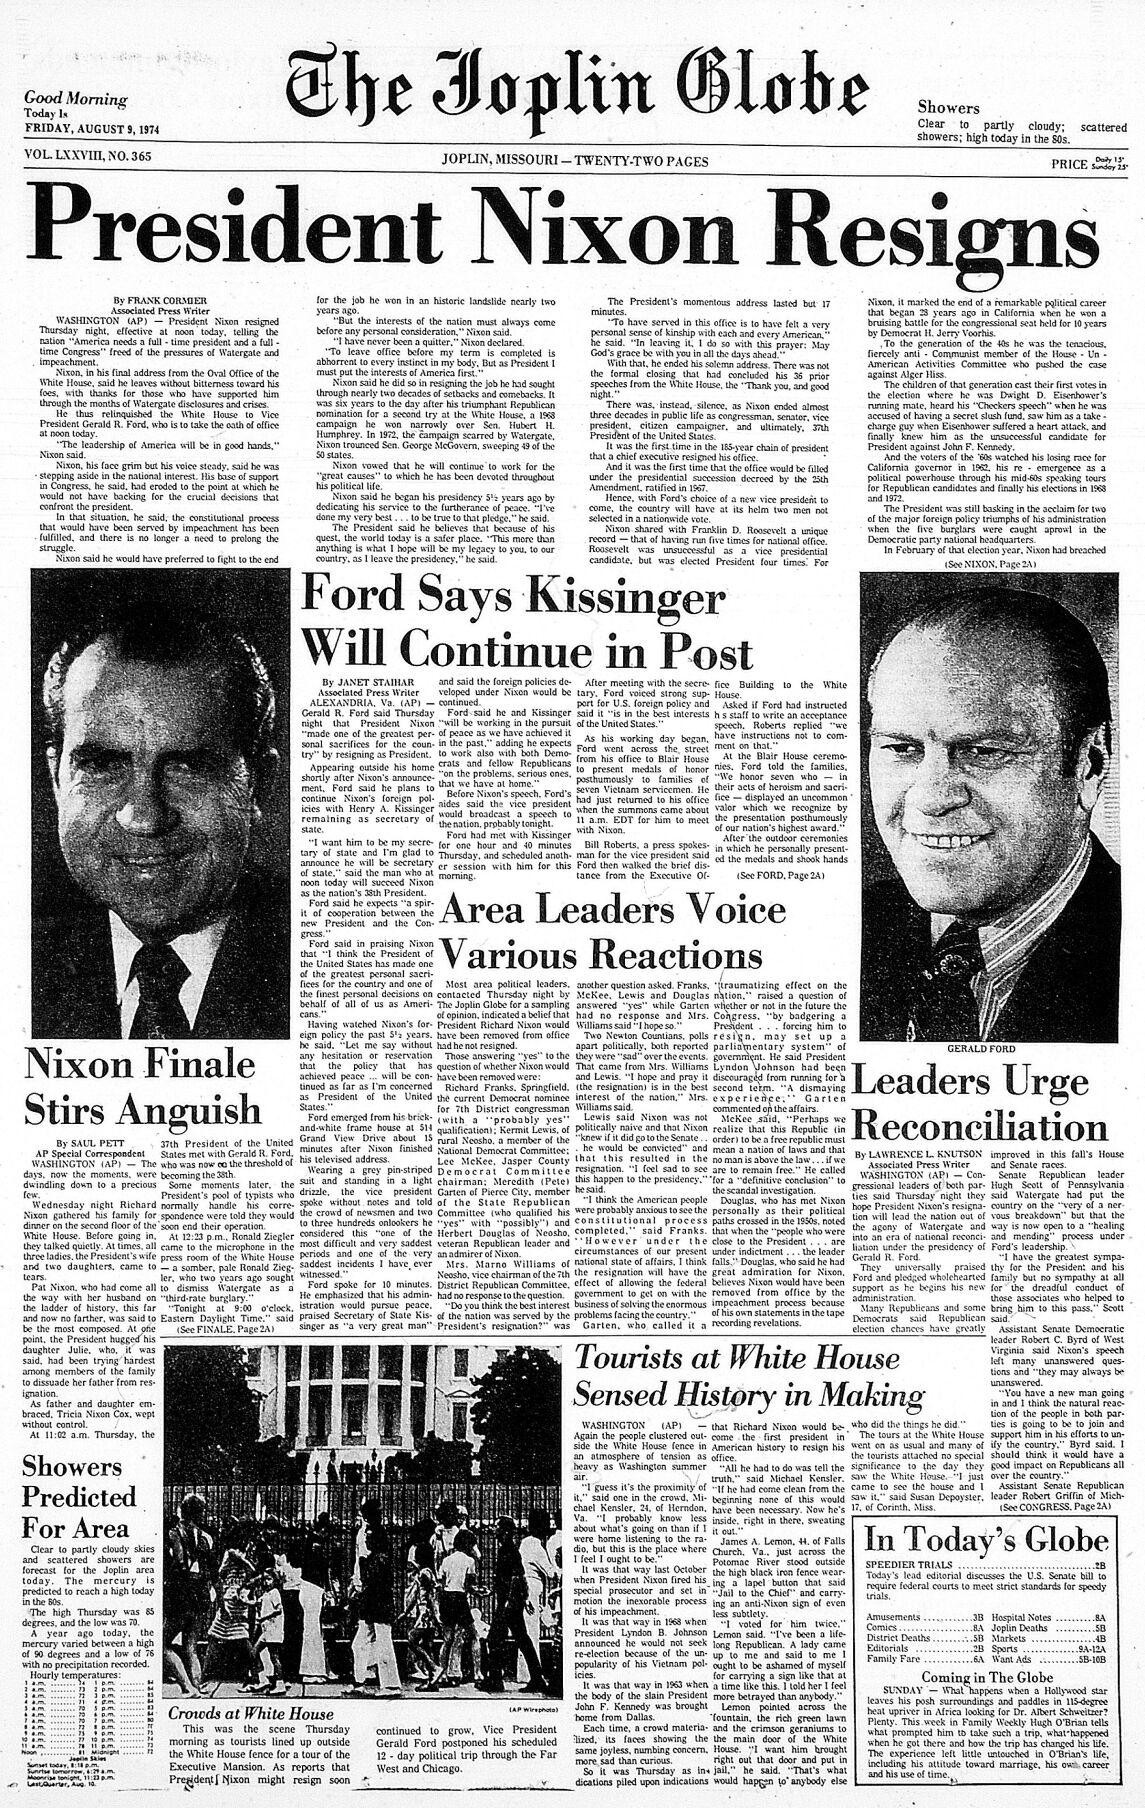 Aug. 9, 1974